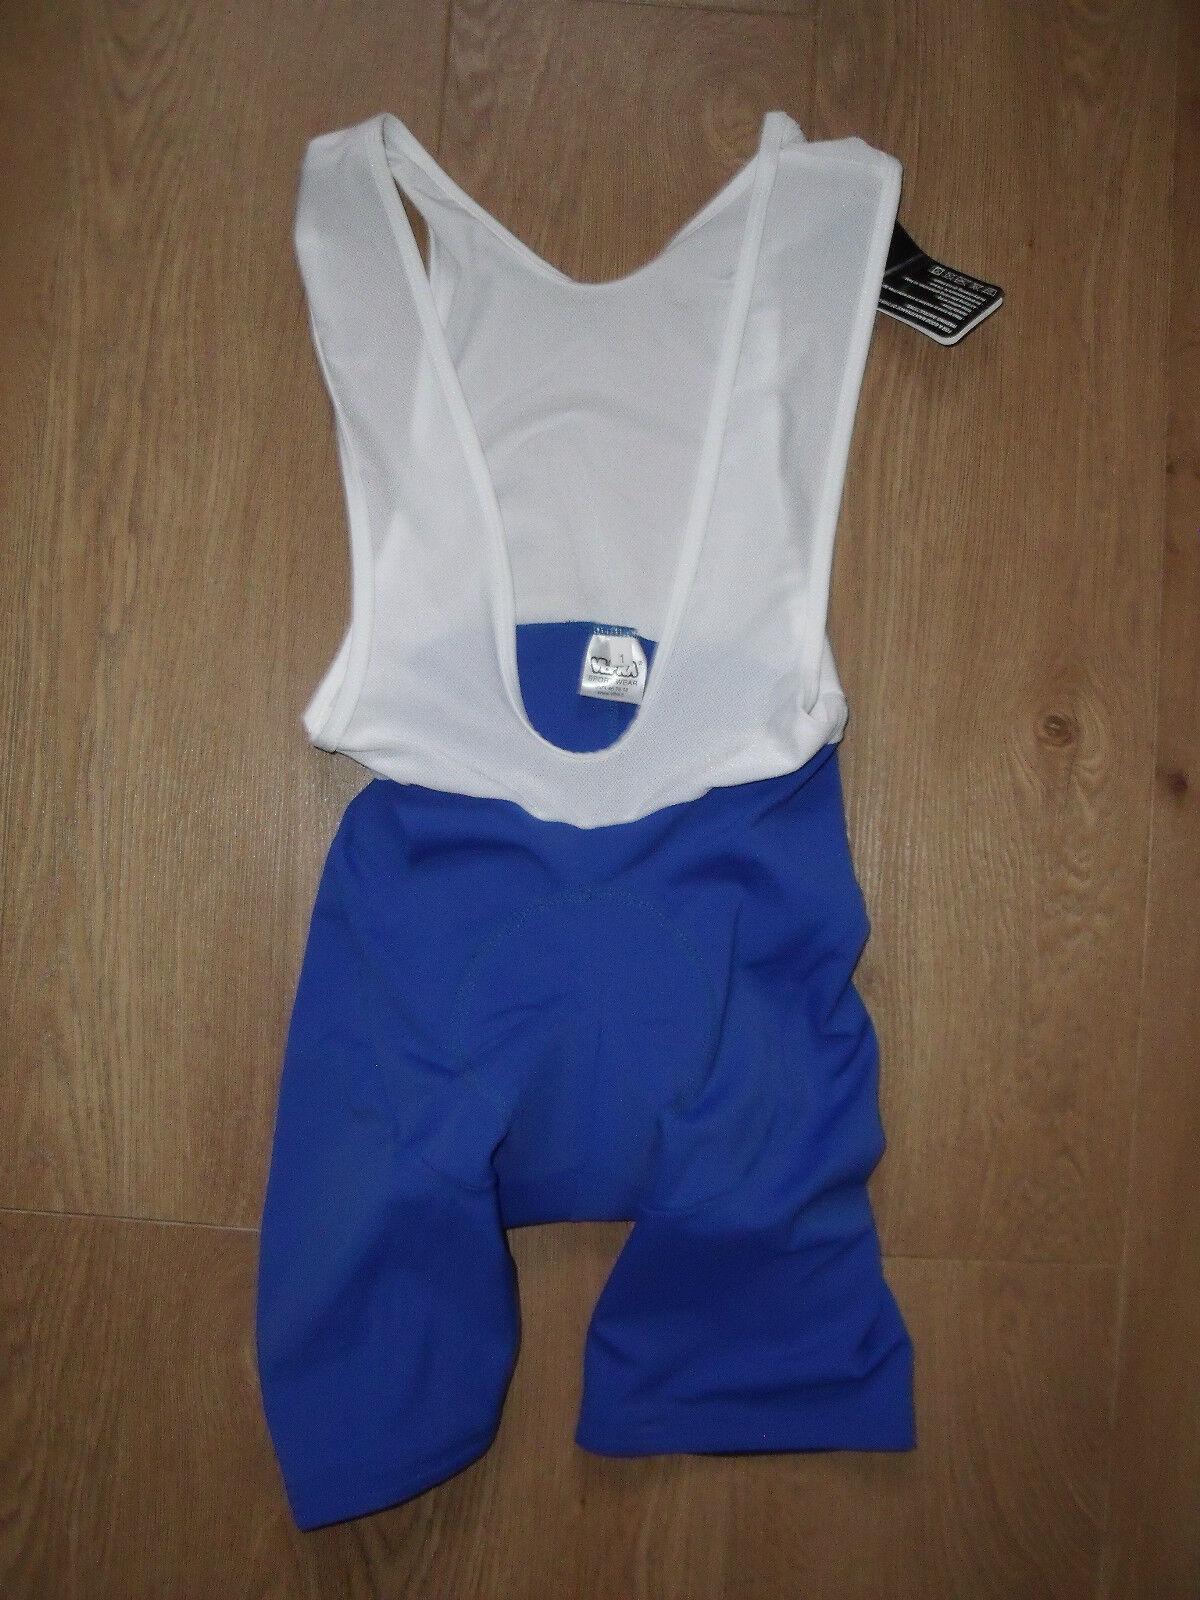 Vifra Italia Hombre Hombre Hombre ciclismo bicicleta Bib Shorts acolchado pequeño azul real f491a7